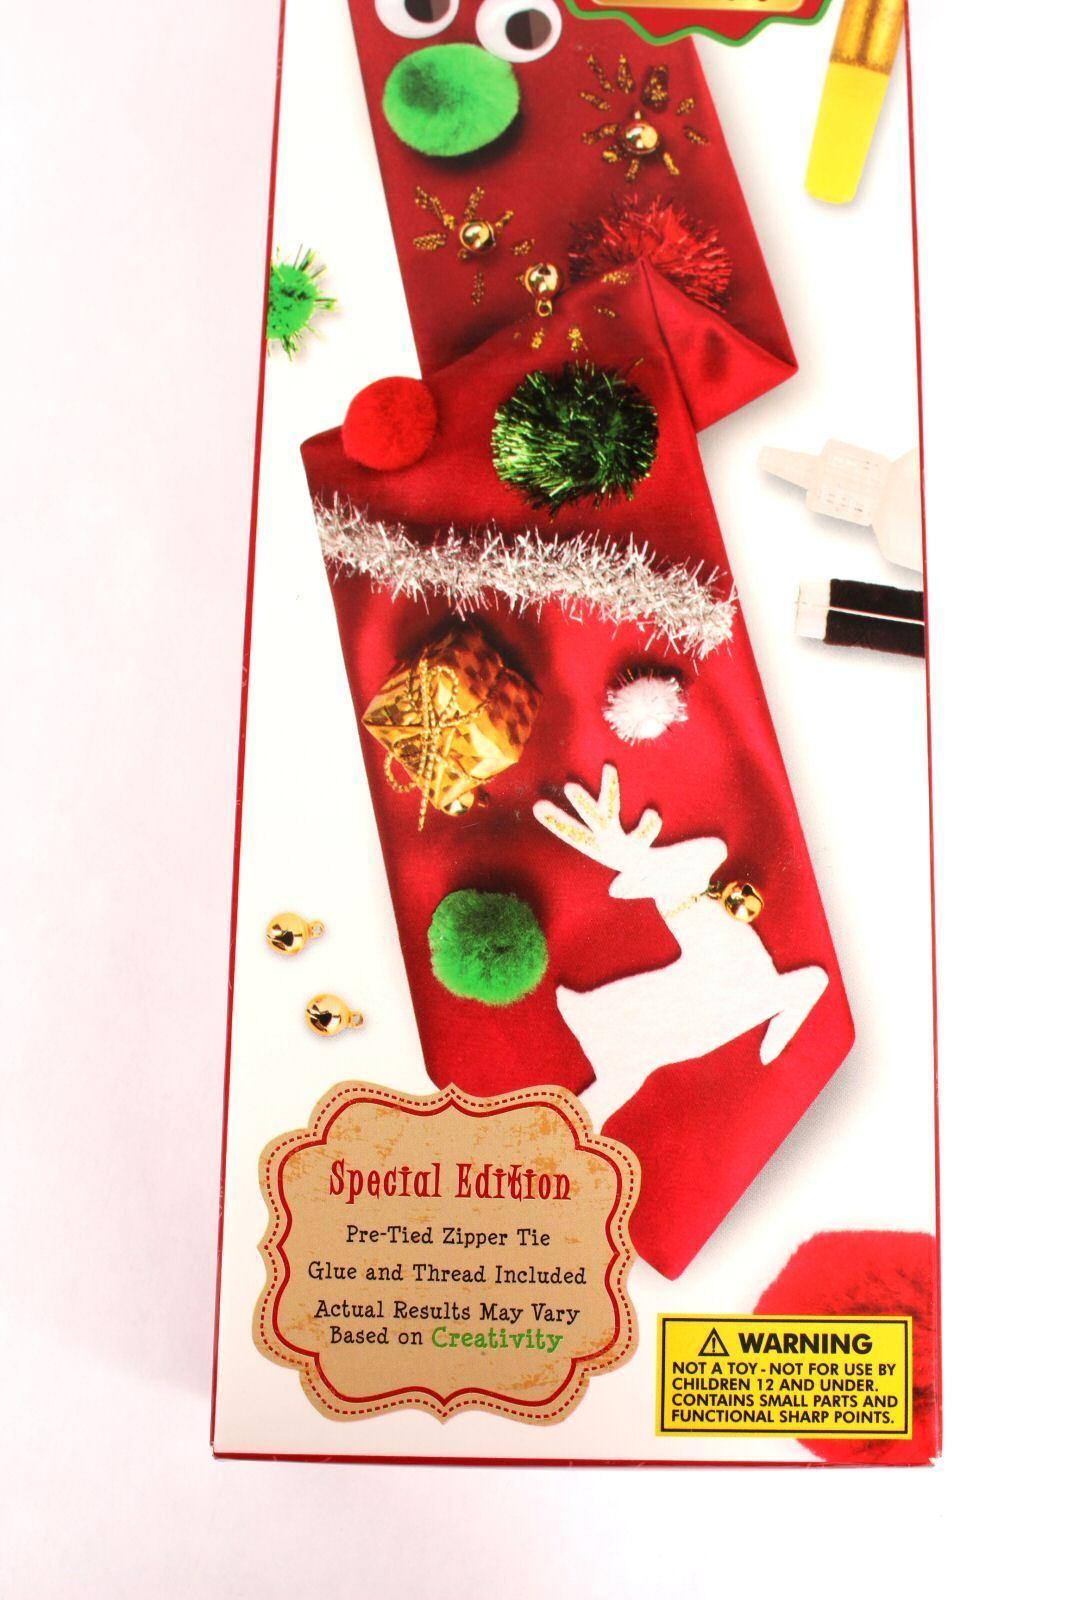 Holiday make your own ugly christmas tie kit pre tied do it yourself new holiday make your own ugly christmas tie kit pre tied do it yourself fun fun solutioingenieria Choice Image